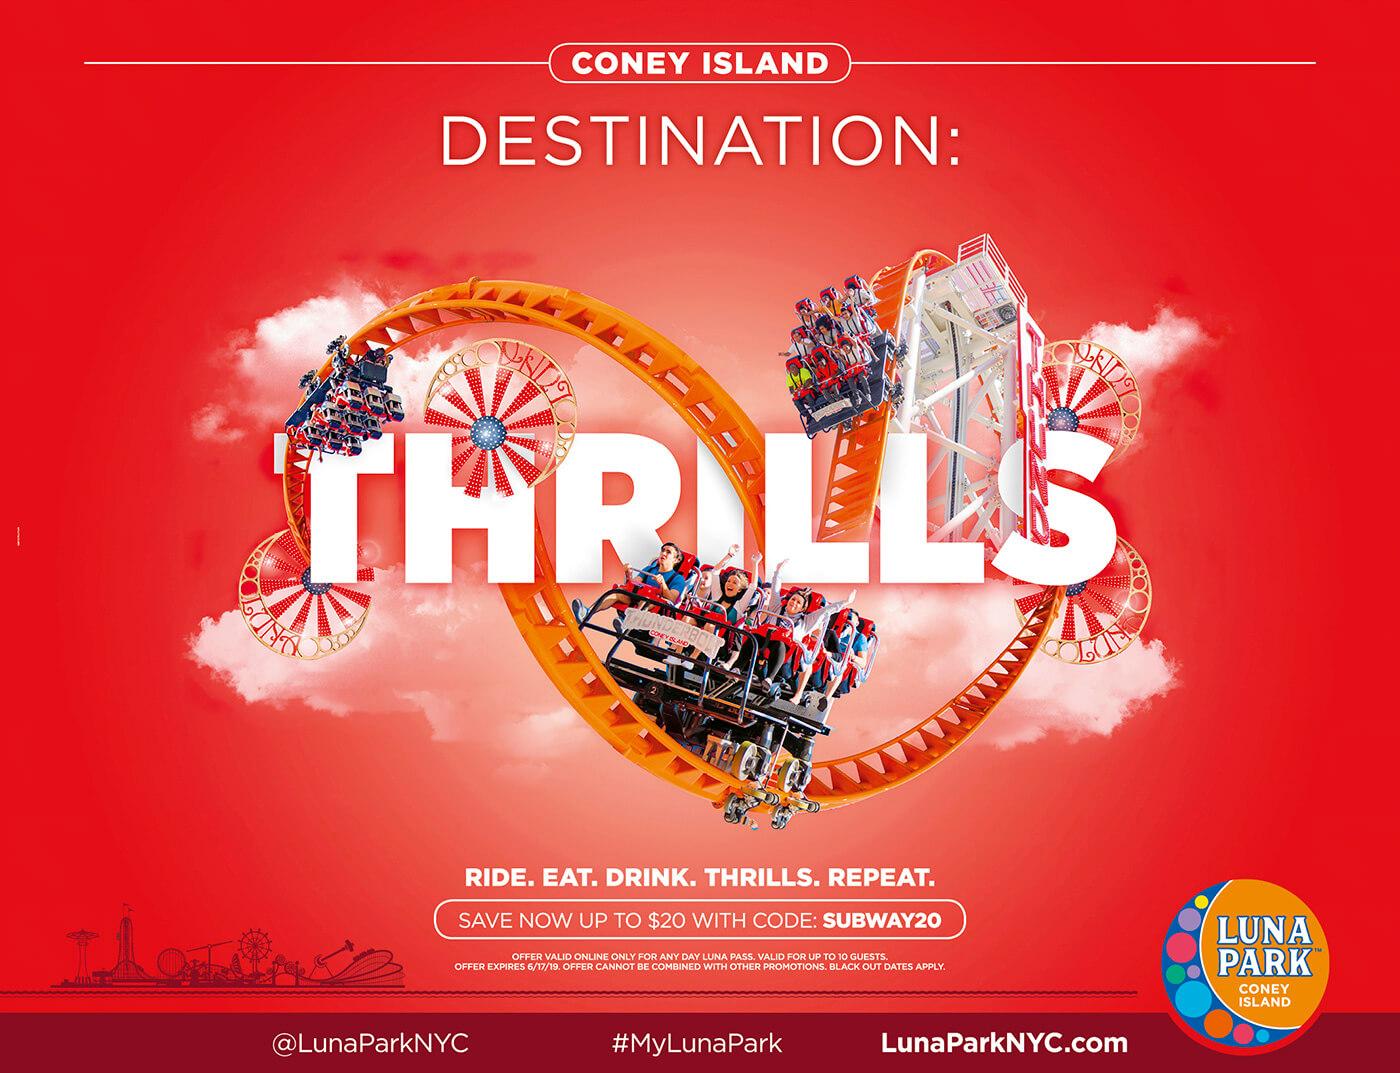 Adv Luna Park - Coney Island Destination: Thrills